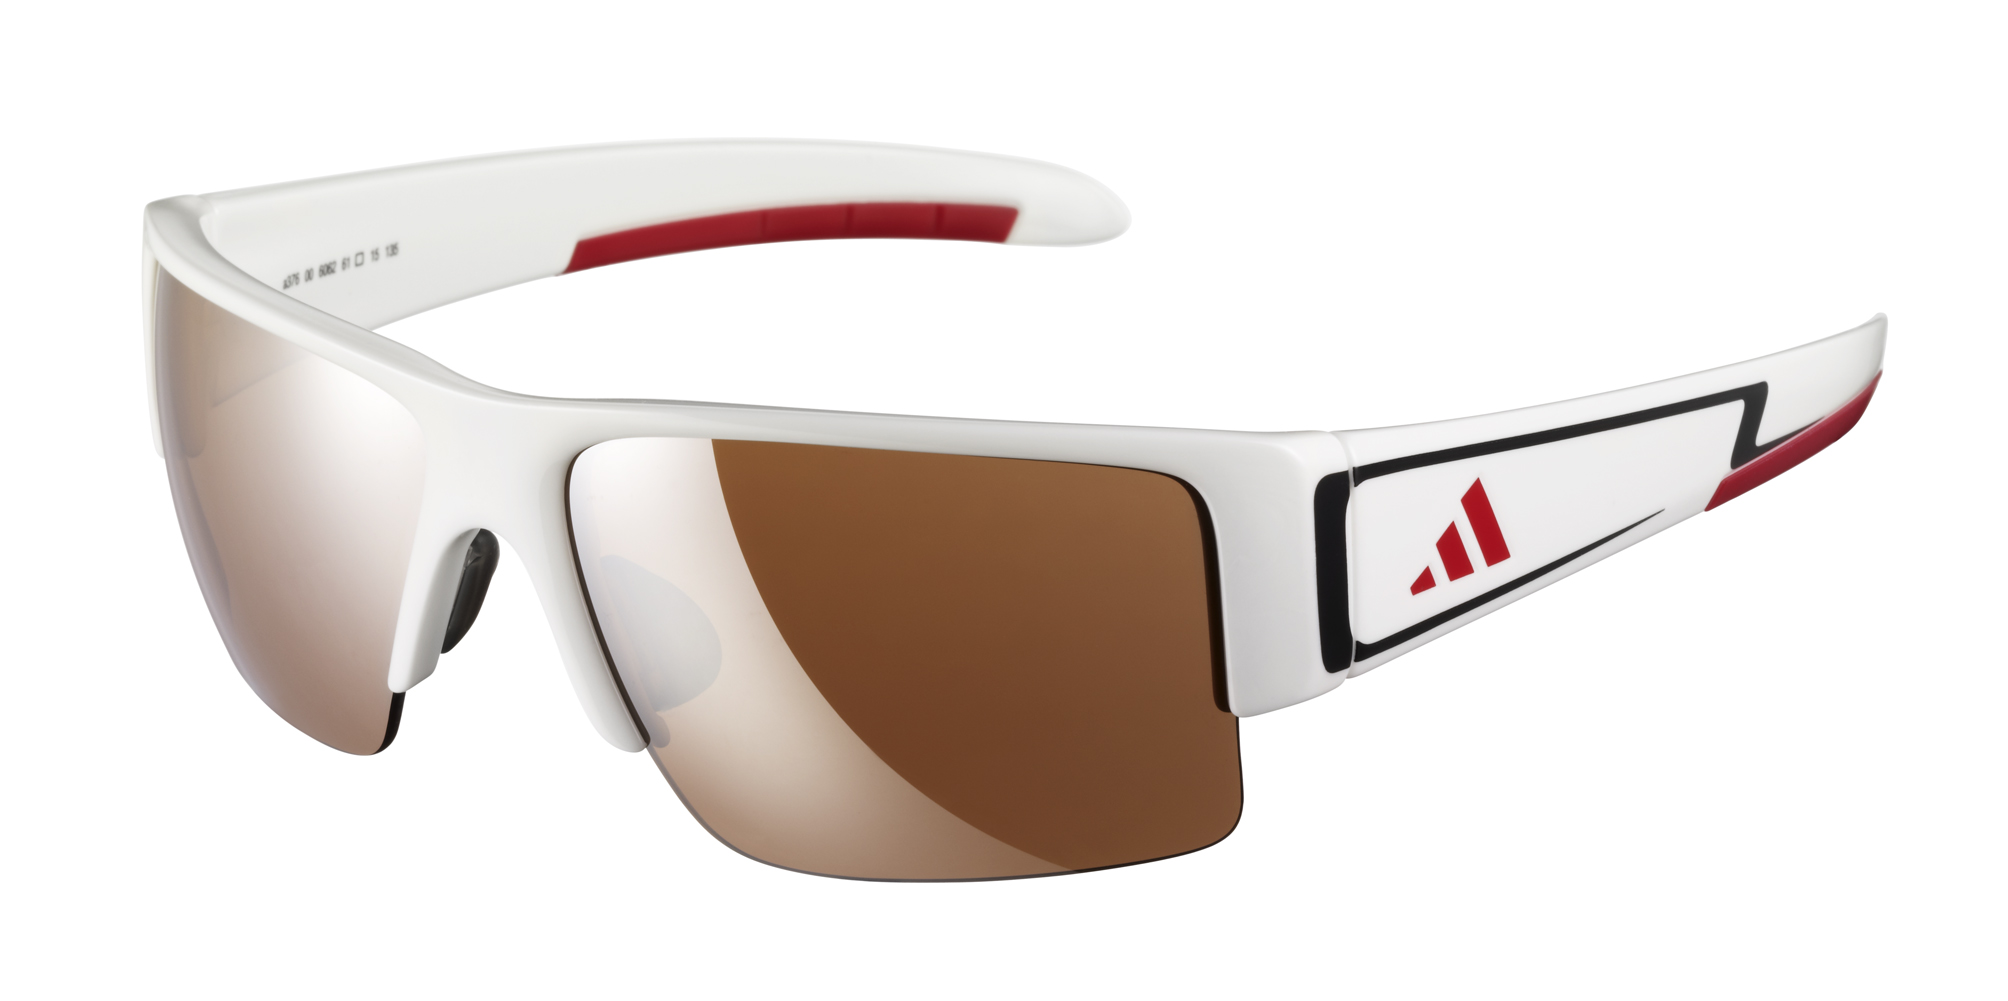 adidas_eyewear_retego_q-series_shinywhit_red_M_a376_00_6062